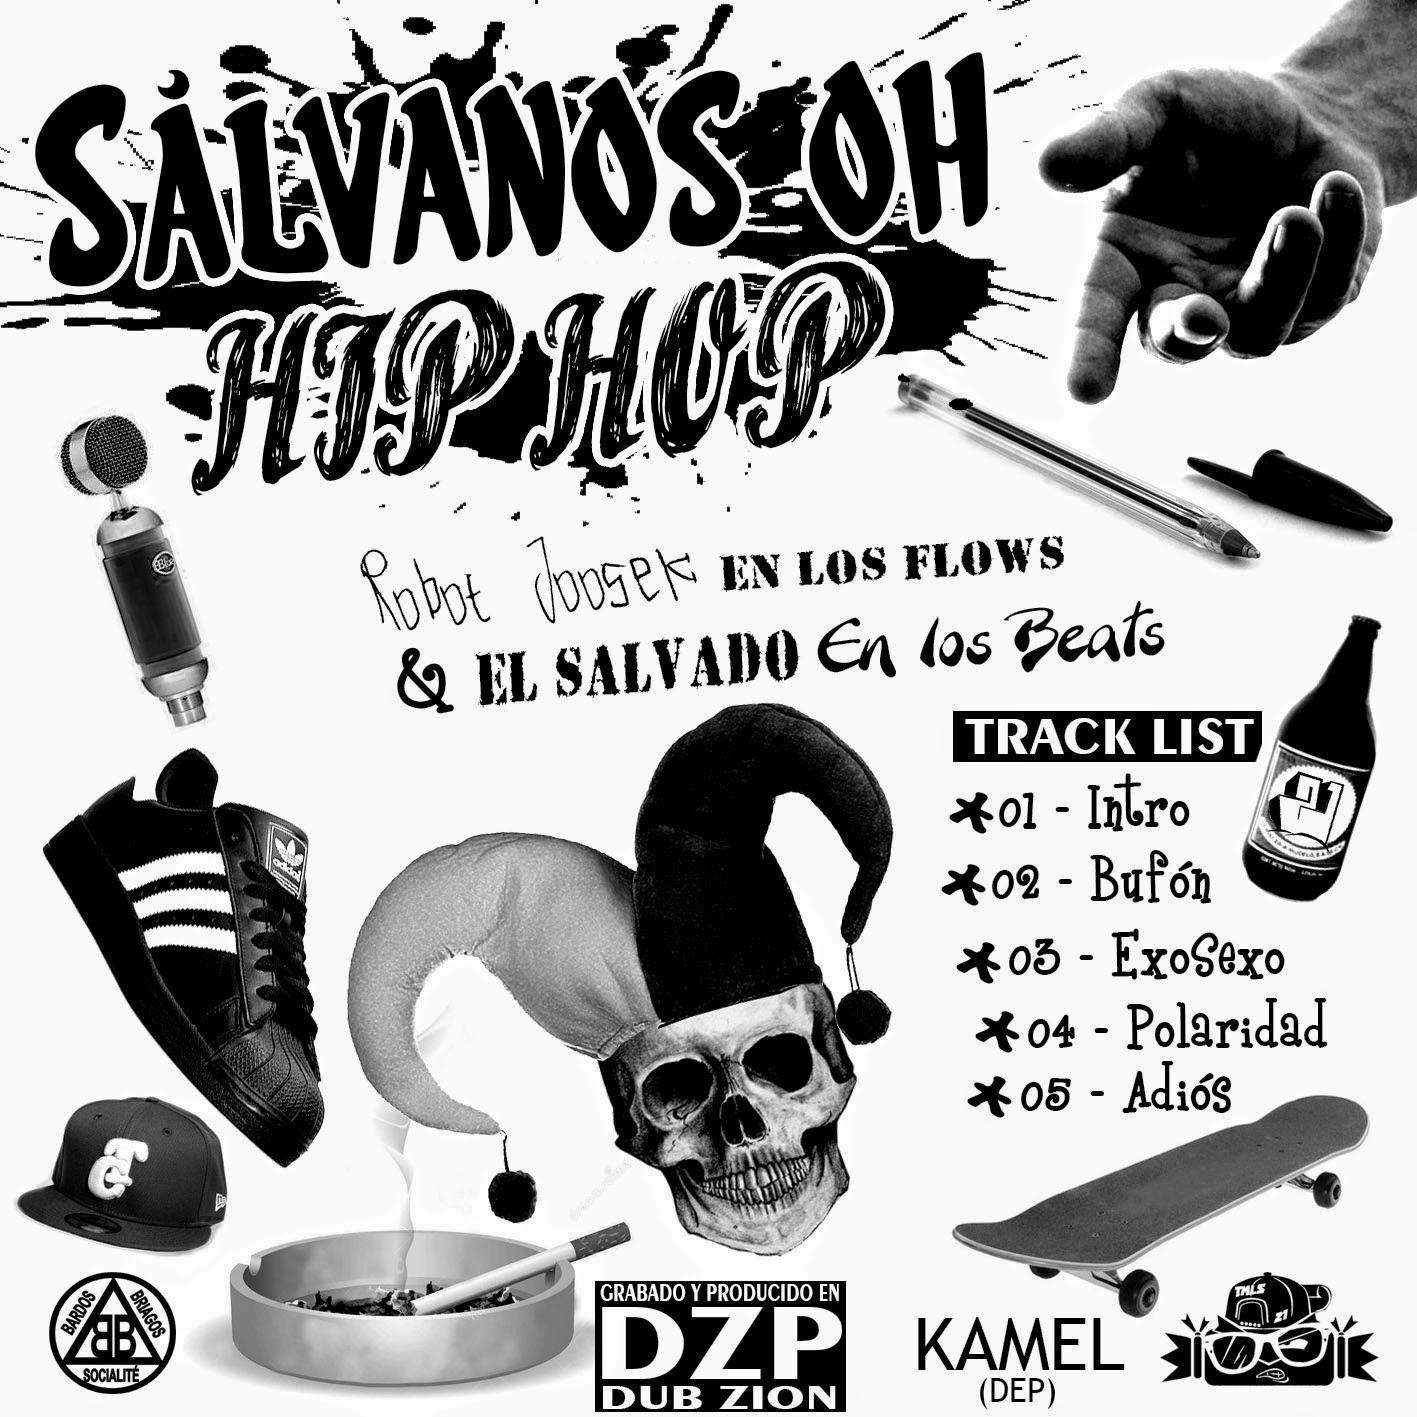 RJSK - SÁLVANOS OH HIP-HOP